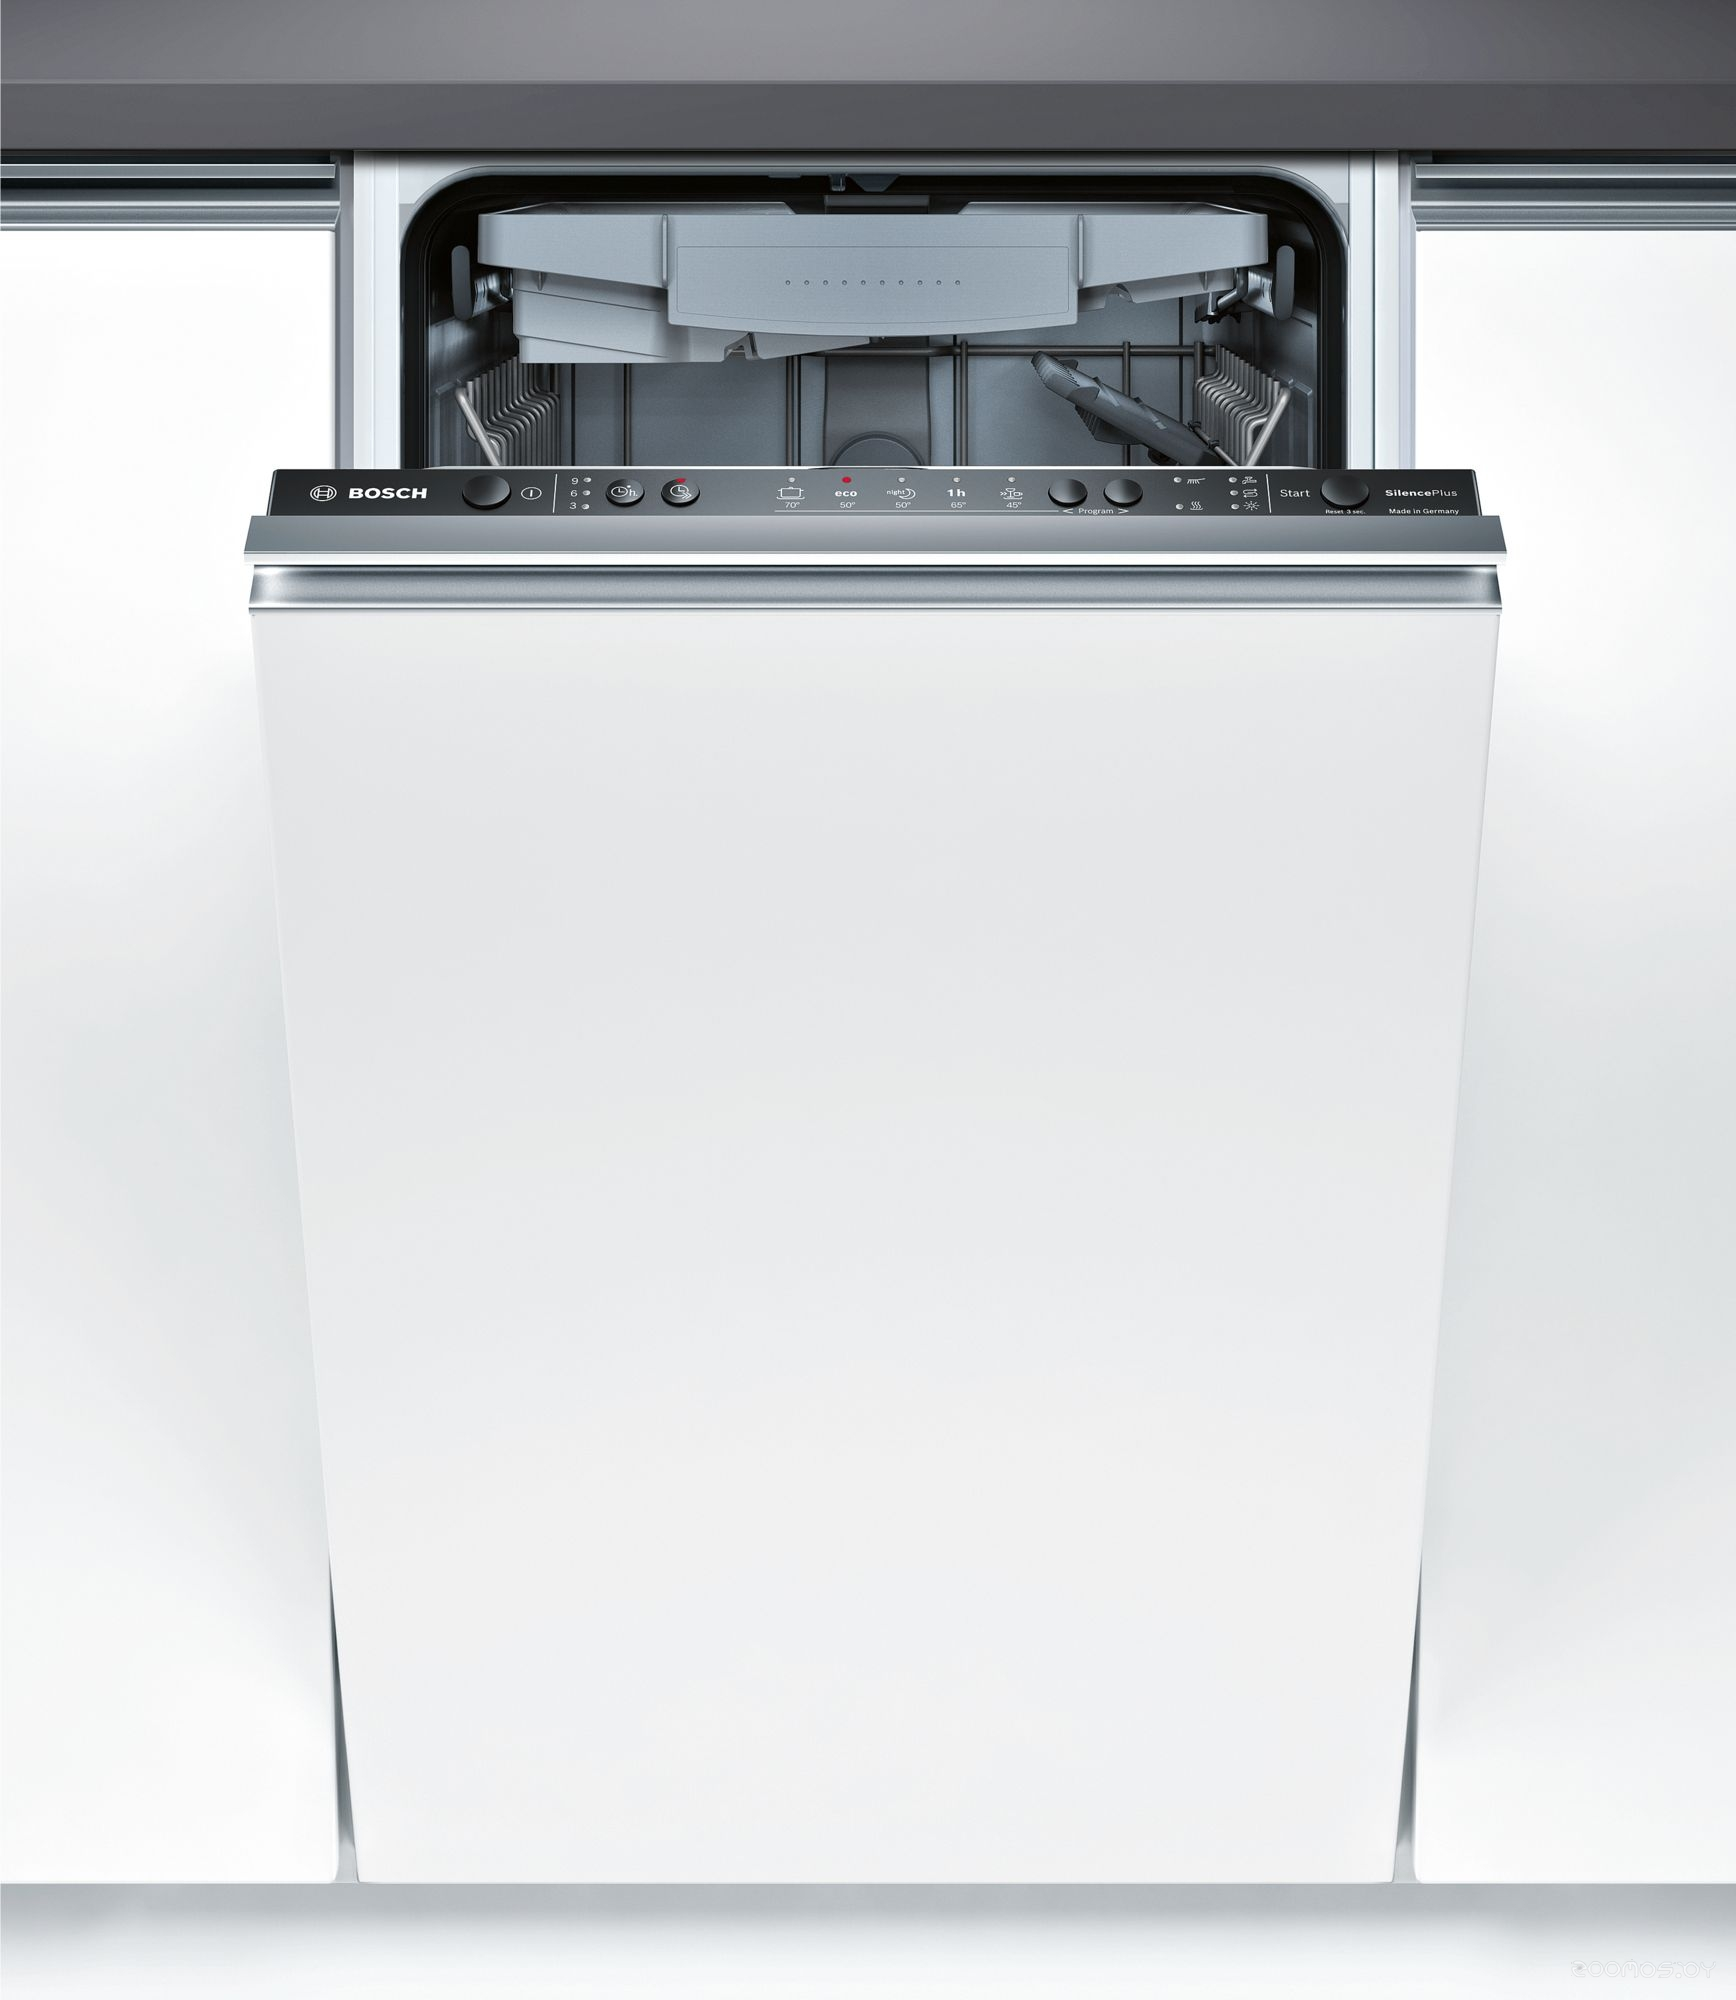 Посудомоечная машина Bosch Serie 2 SPV25FX70R